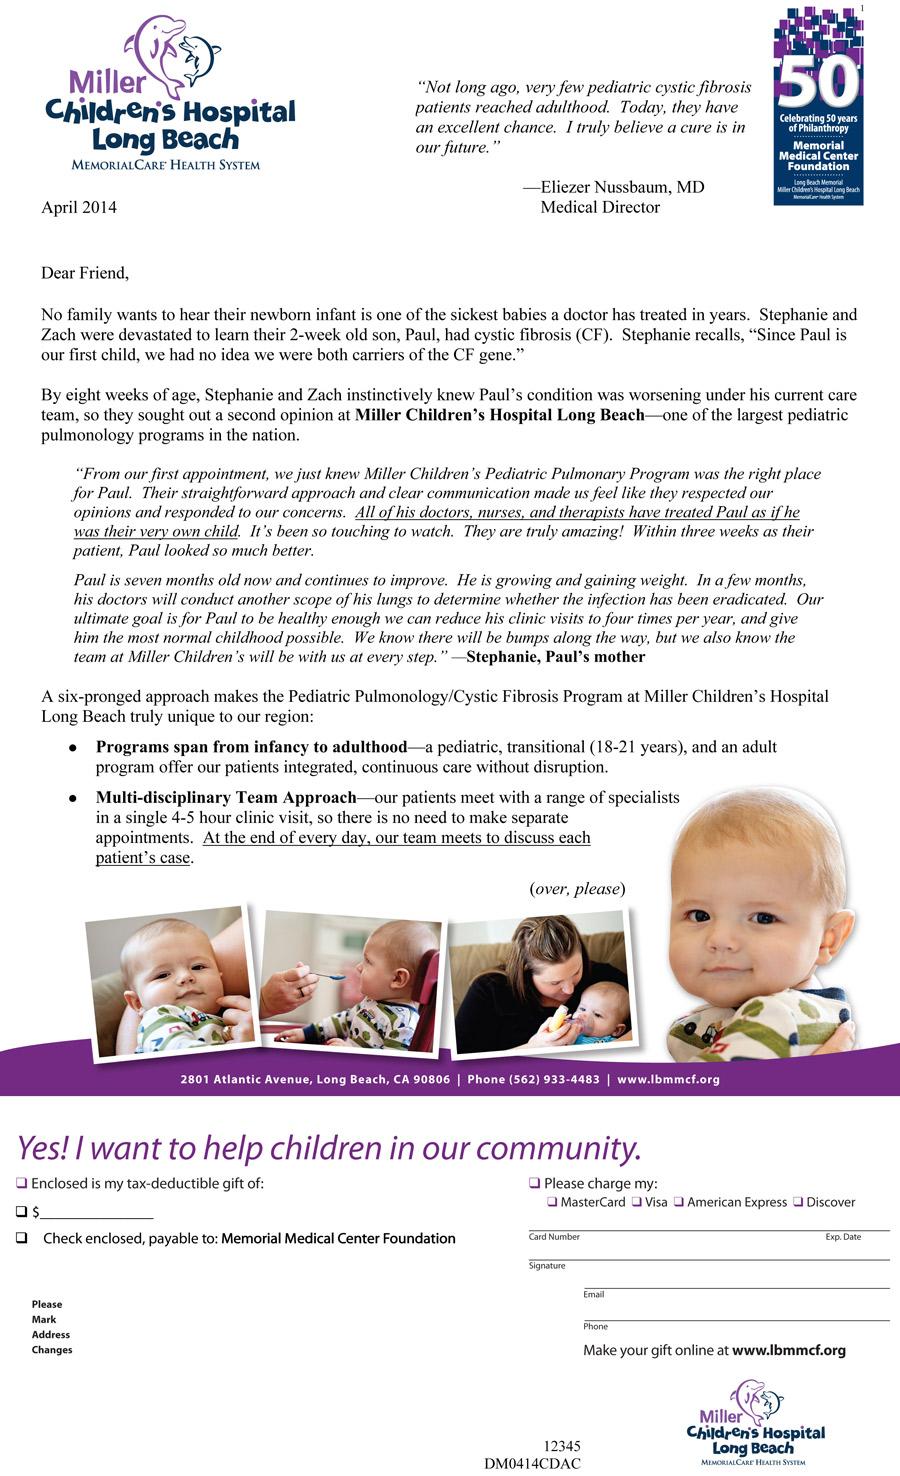 Millers-Childrens-Hospital